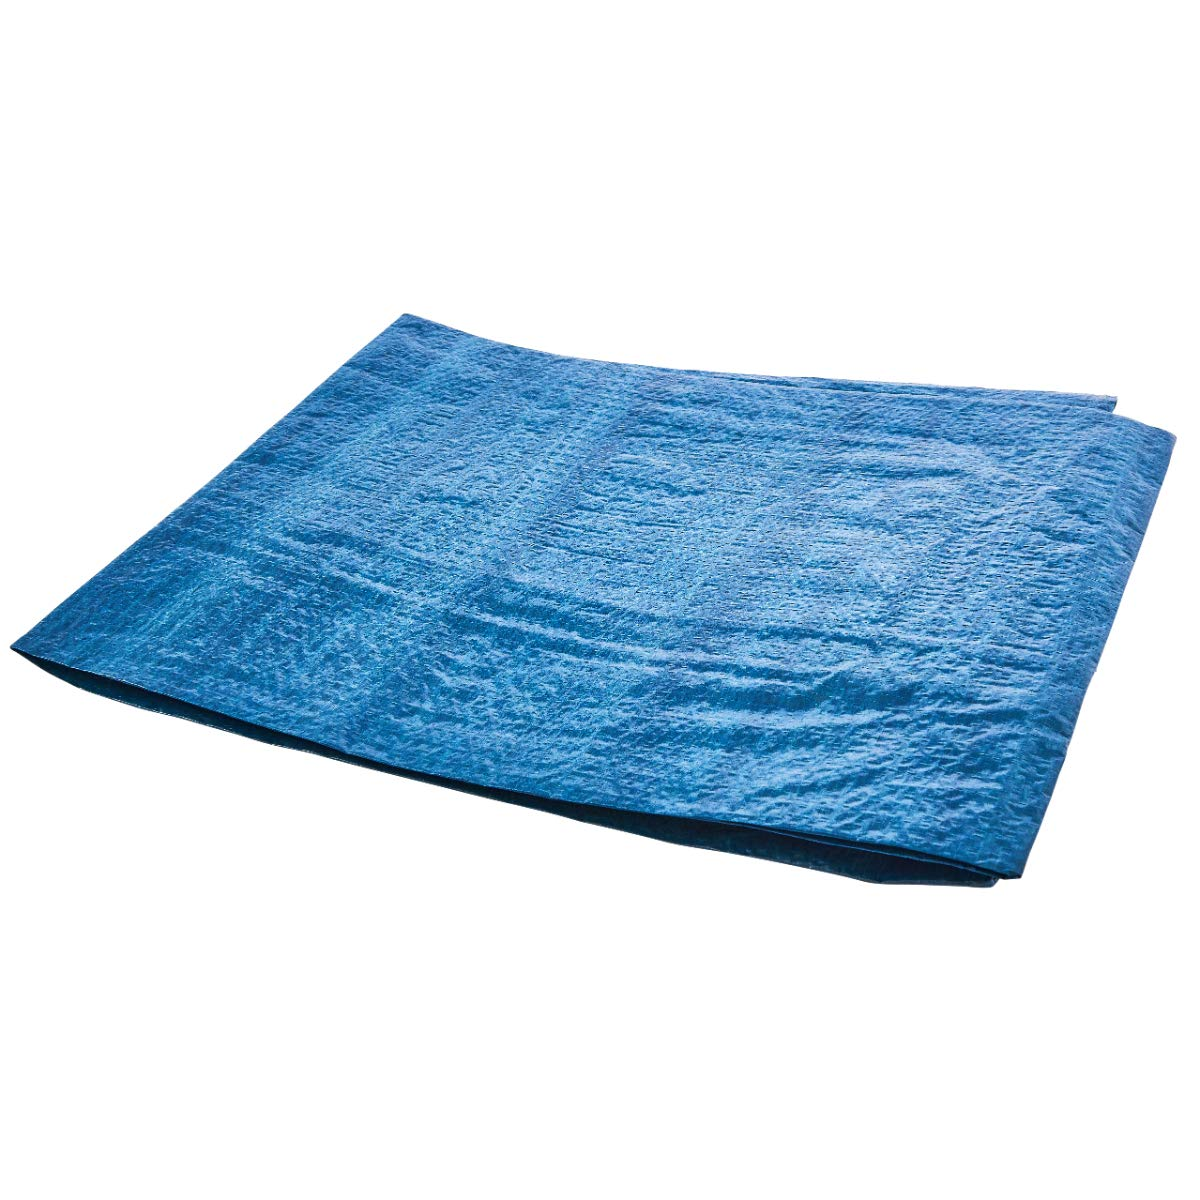 Am-Tech 6 x 4 Pulgadas Tela Impermeable, Azul, S4700: Amazon.es ...